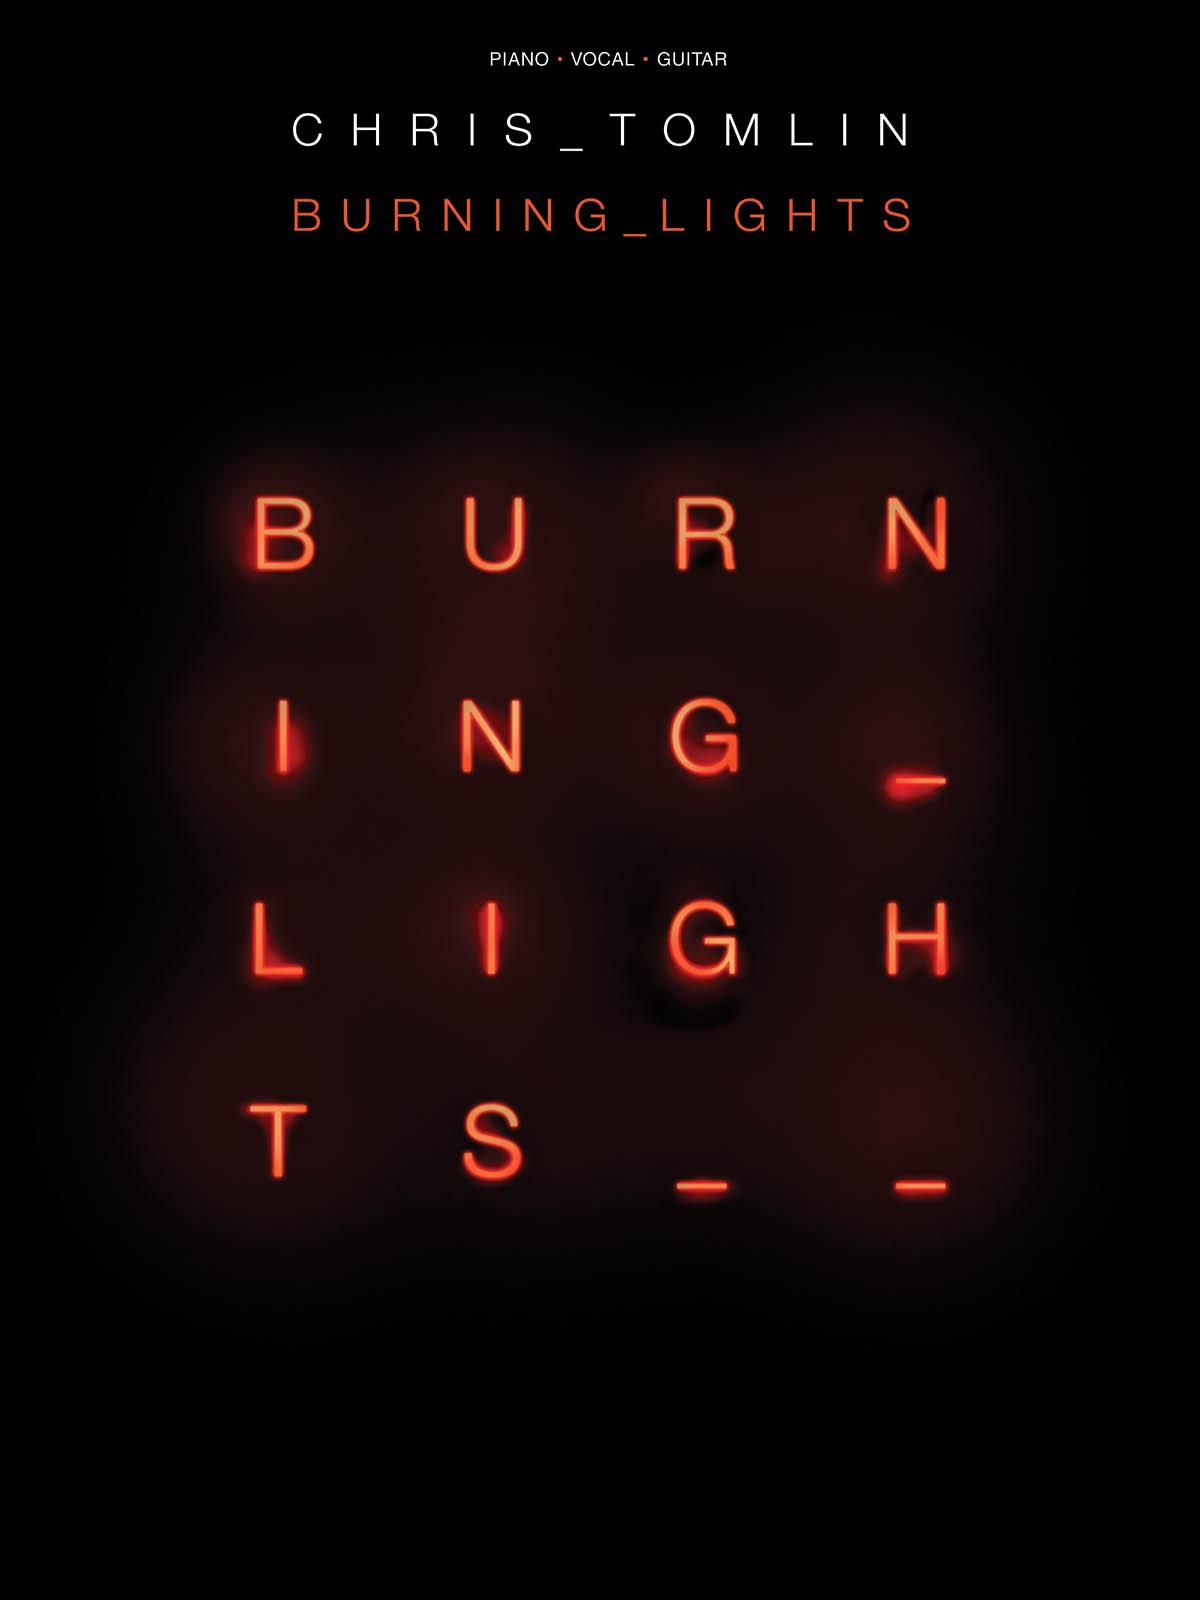 Chris Tomlin - Burning Lights: Piano  Vocal  Guitar: Mixed